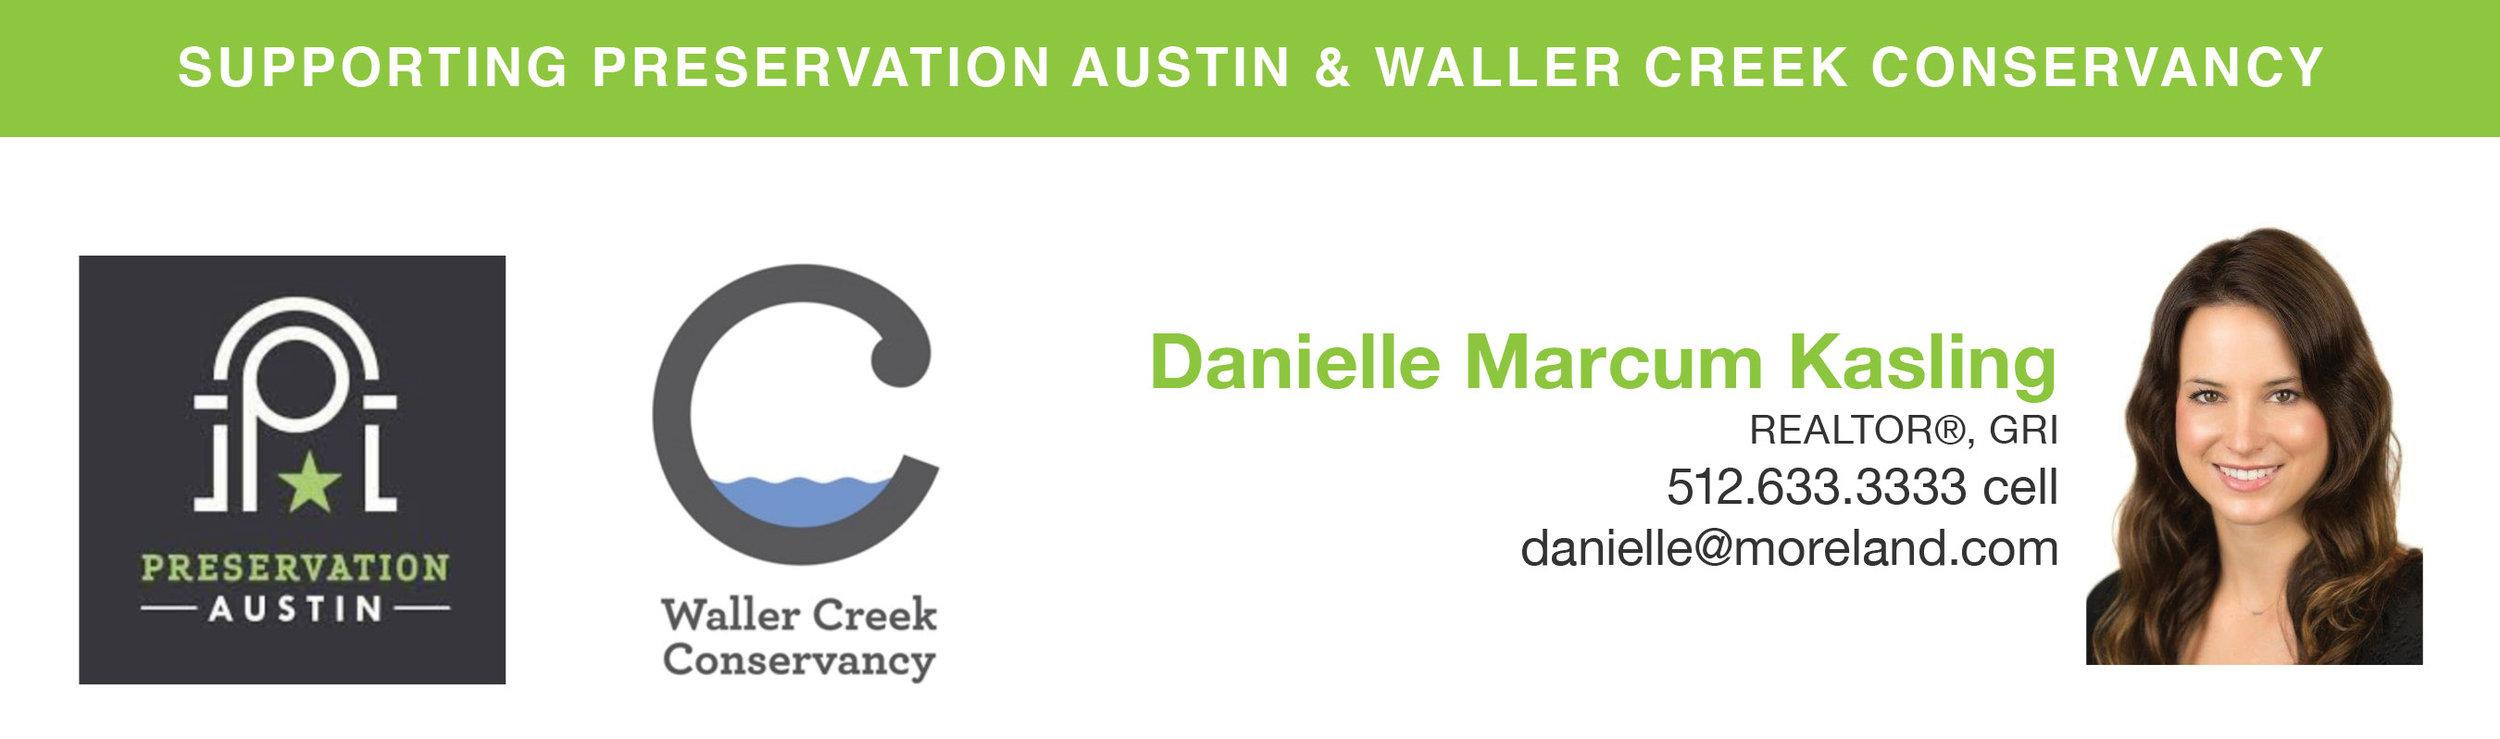 Danielle Marcum Kasling AA2019 Blog.jpg